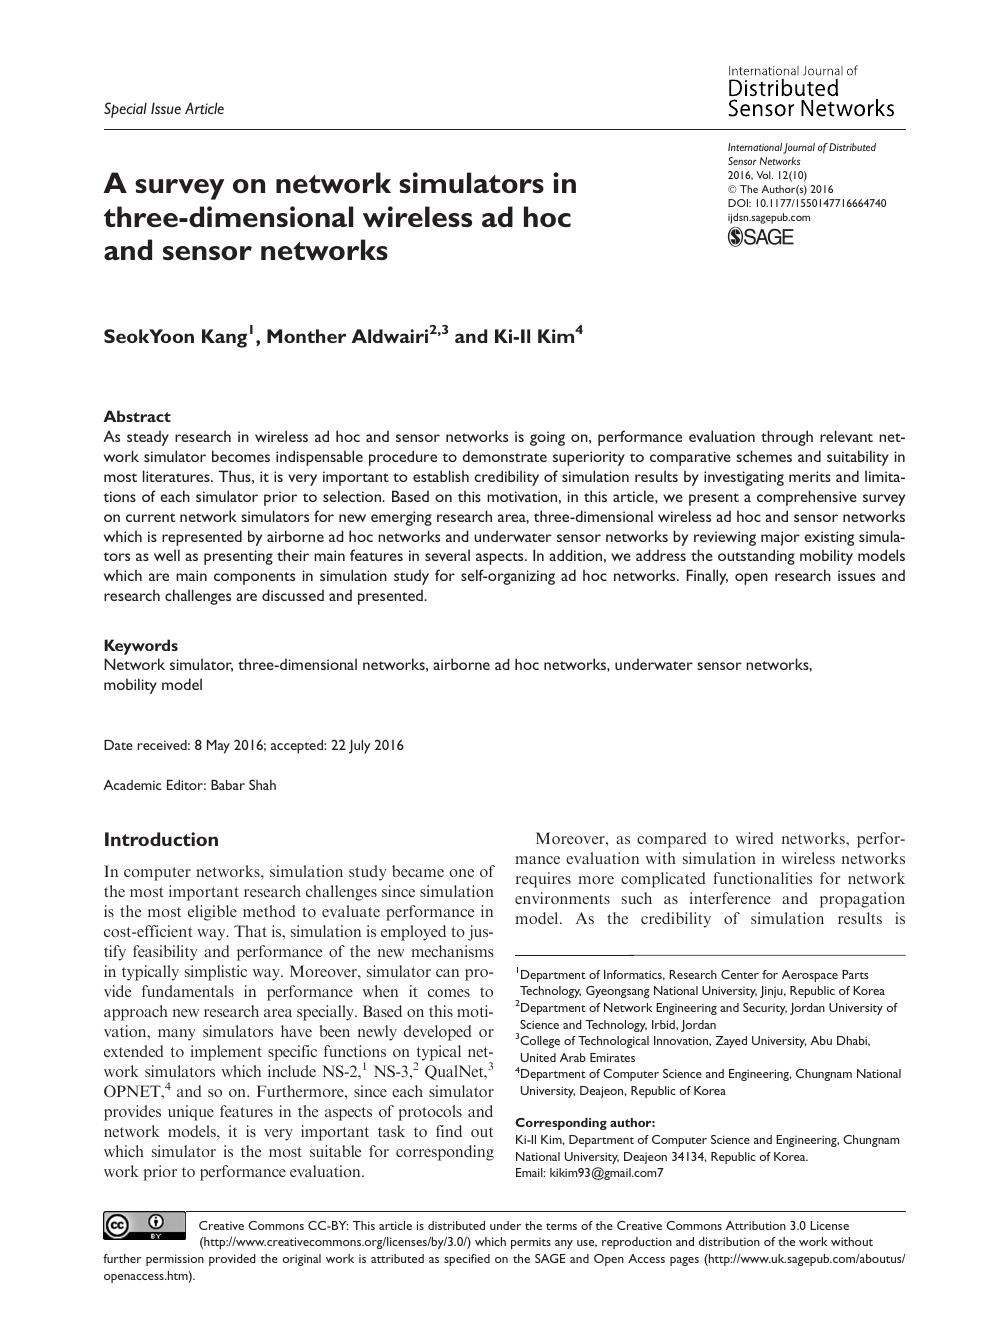 A survey on network simulators in three-dimensional wireless